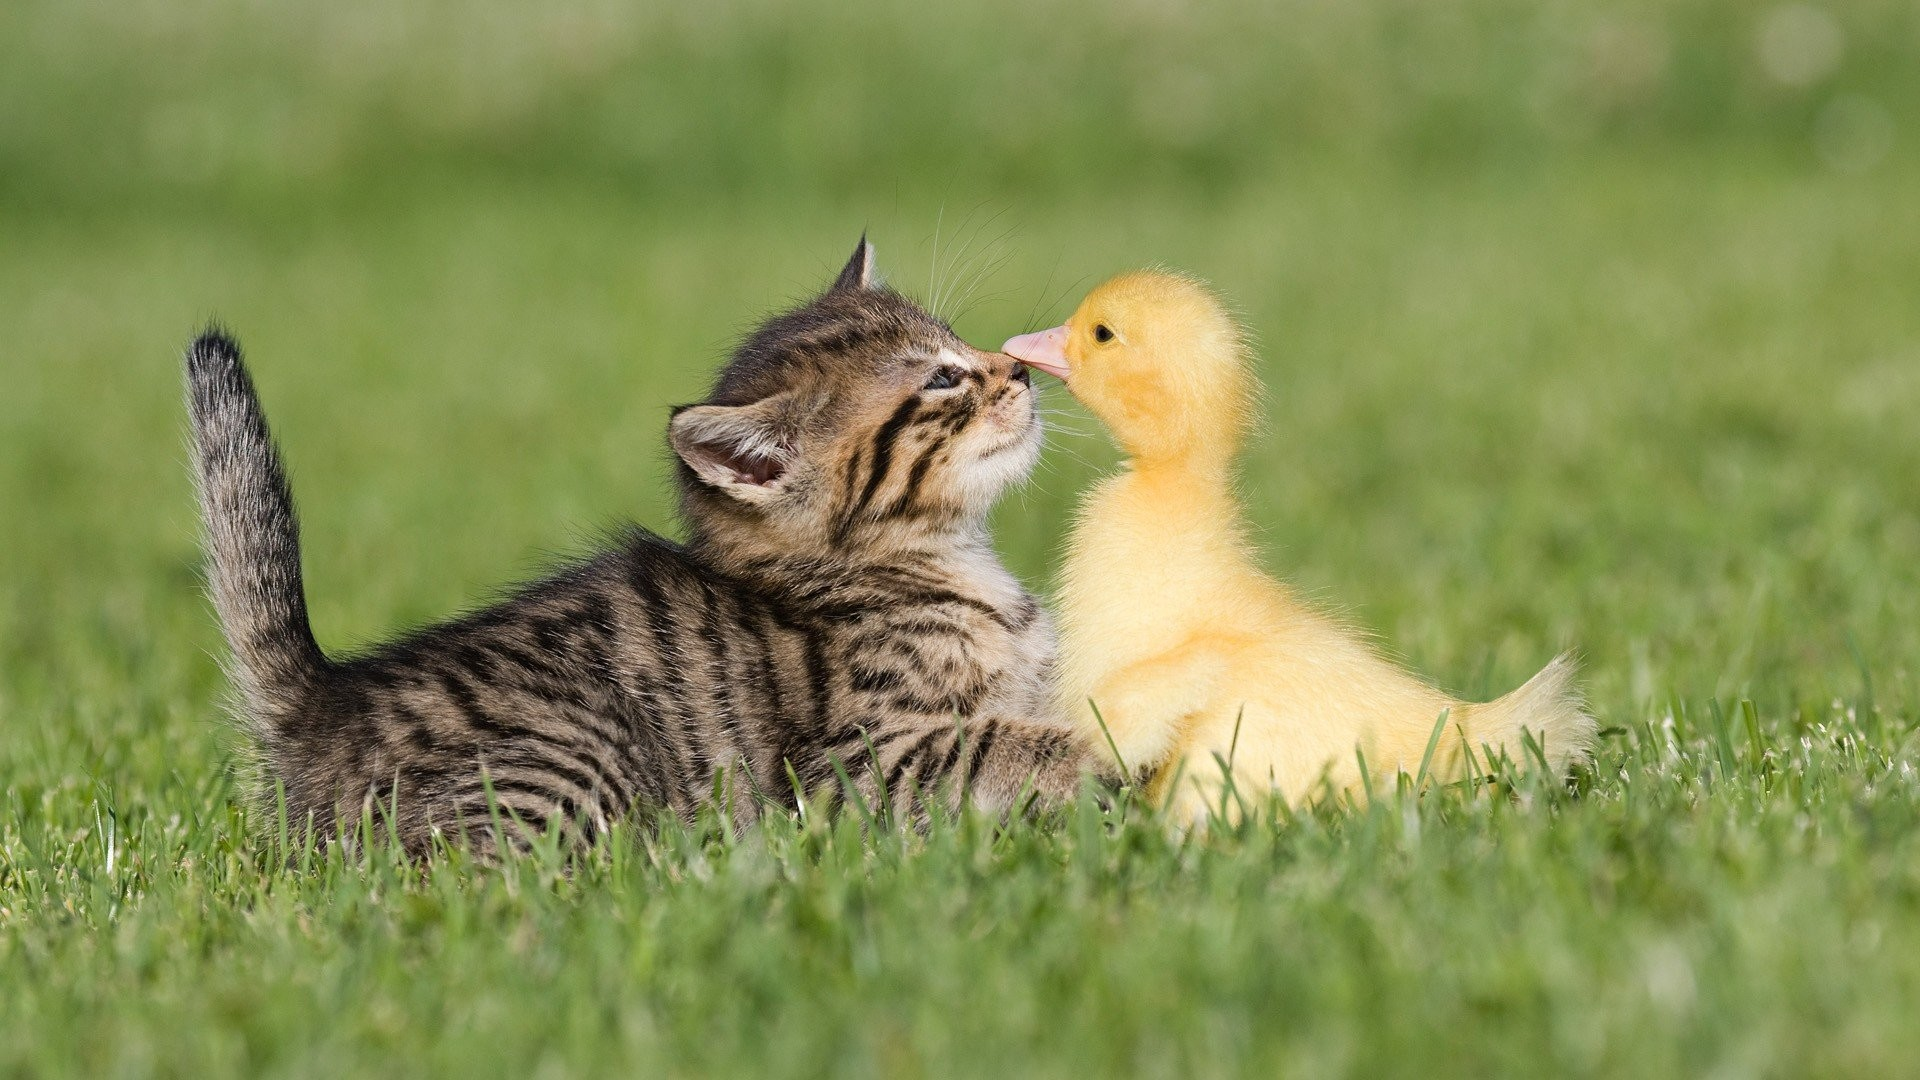 Birds cats animals ducks duckling kittens baby birds wallpaper |  | 281480 | WallpaperUP